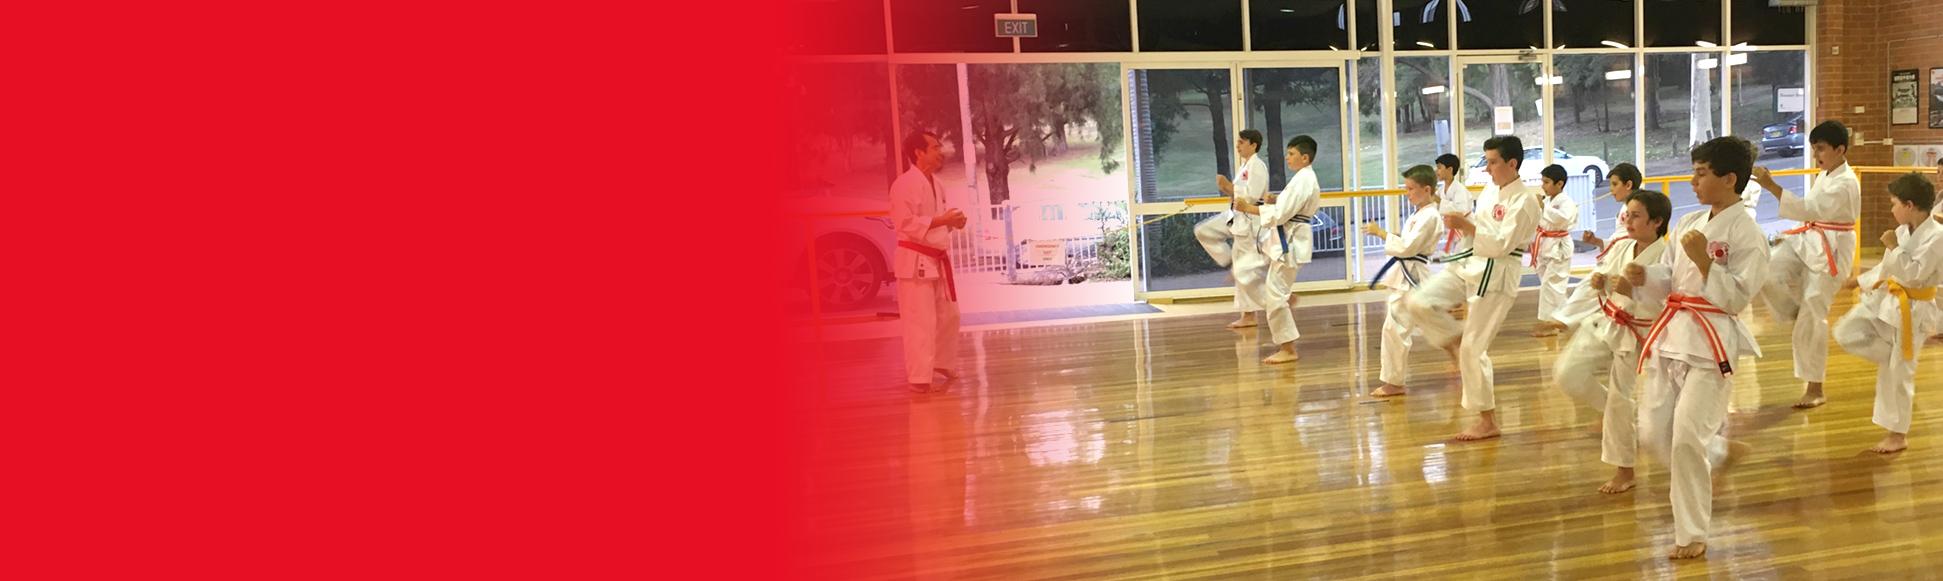 The Institute of Karate